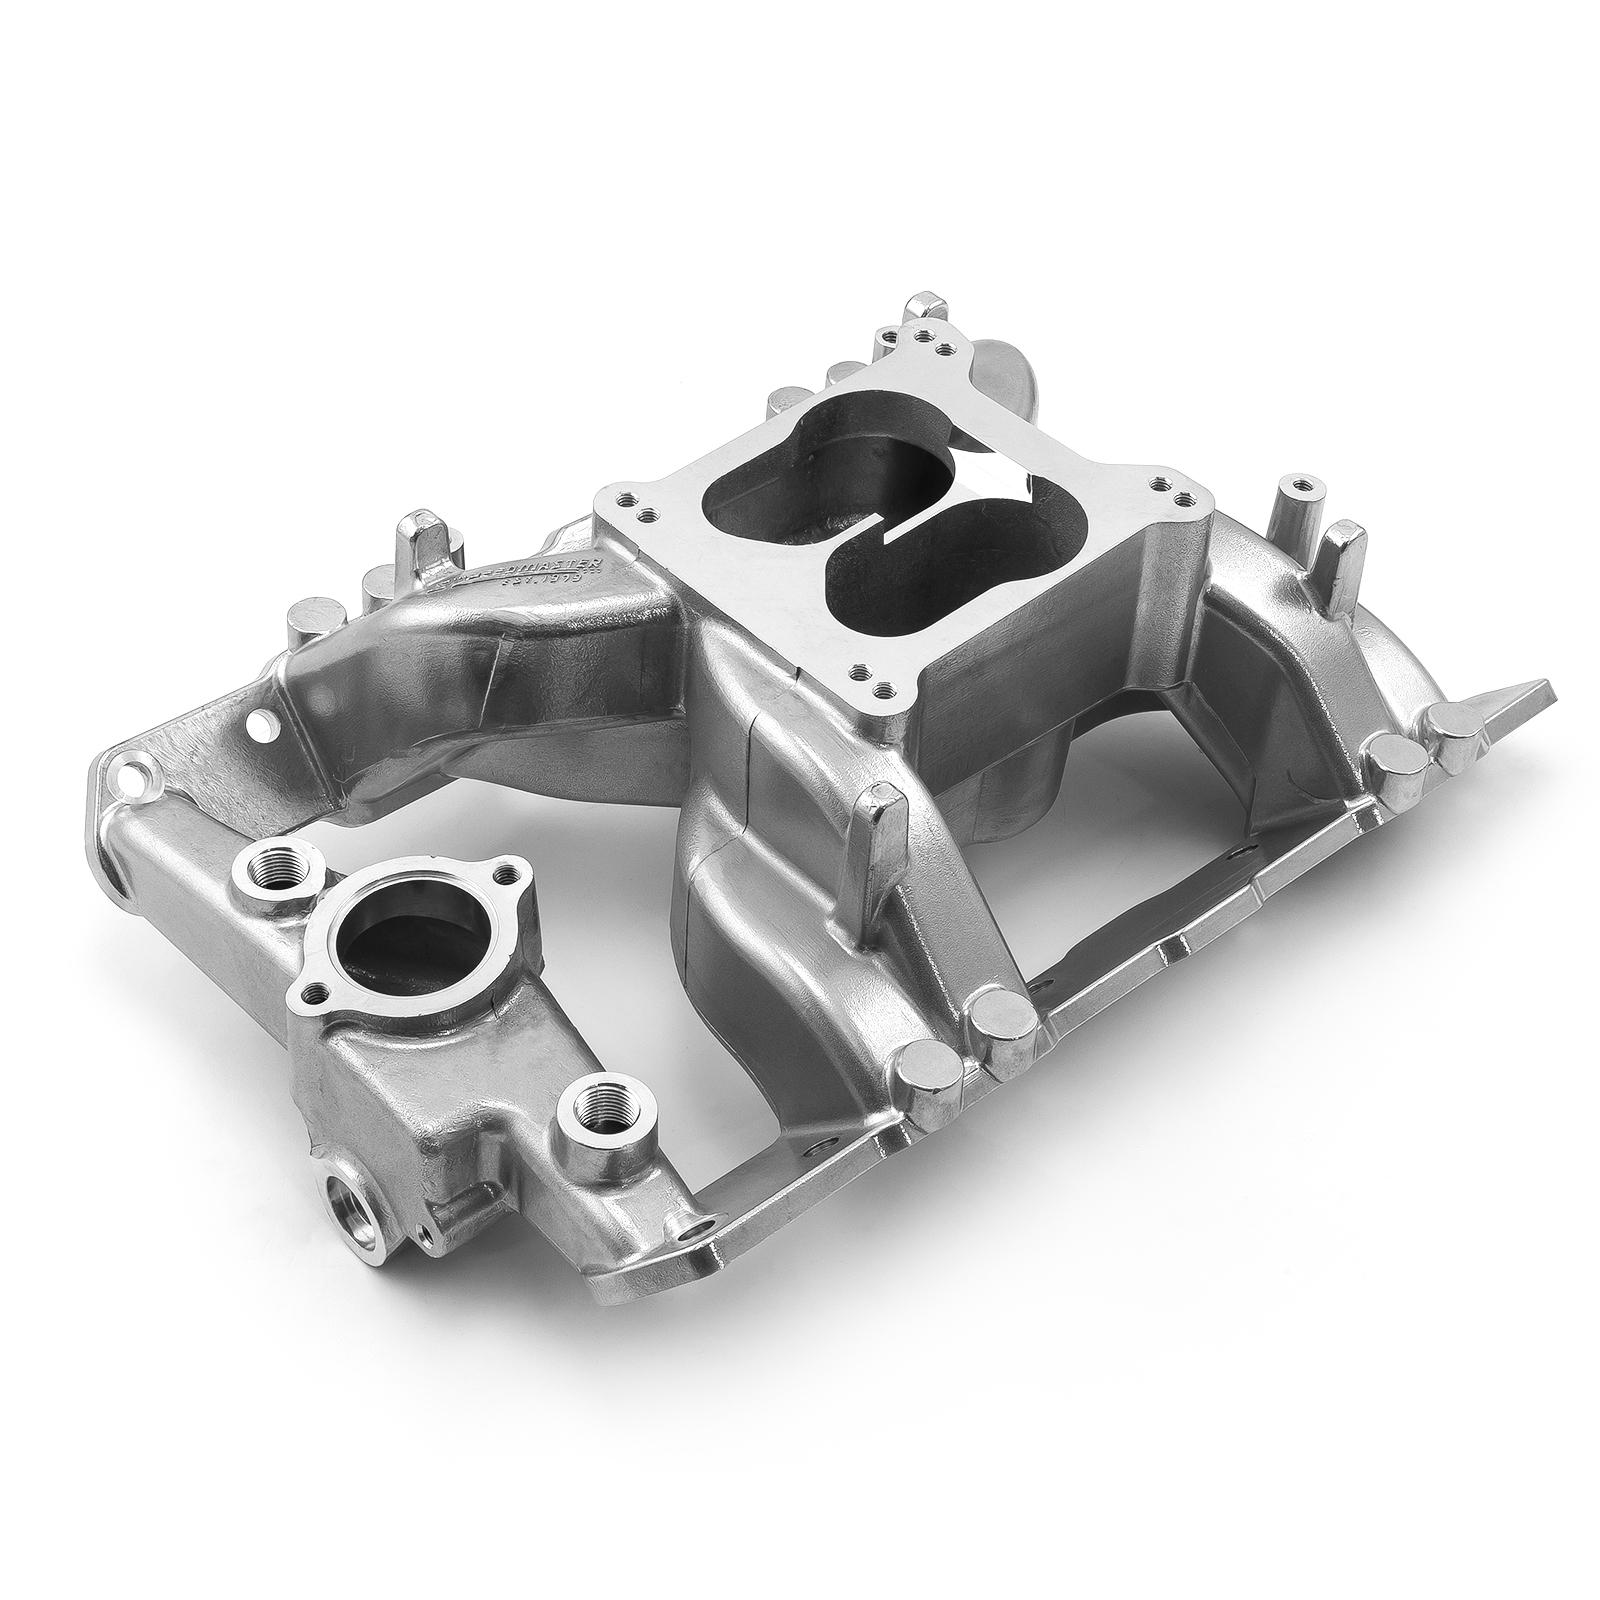 Pontiac 326 350 389 400 421 428 455 MidRise Air Intake Manifold Machine Polished